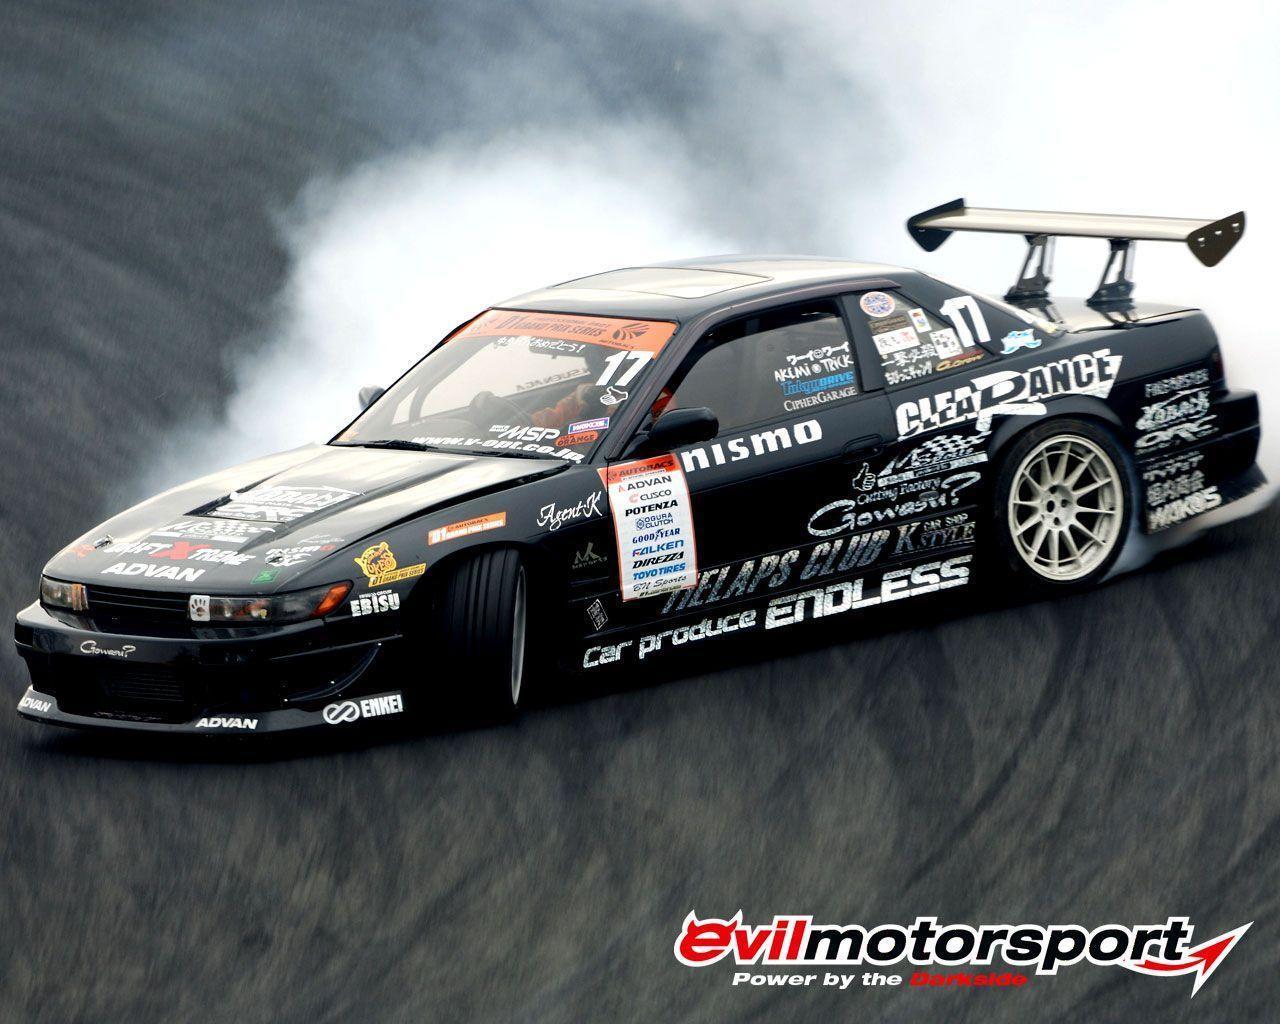 Cool Cars Drifting Wallpapers Hd Drift Wallpapers Wallpaper Cave